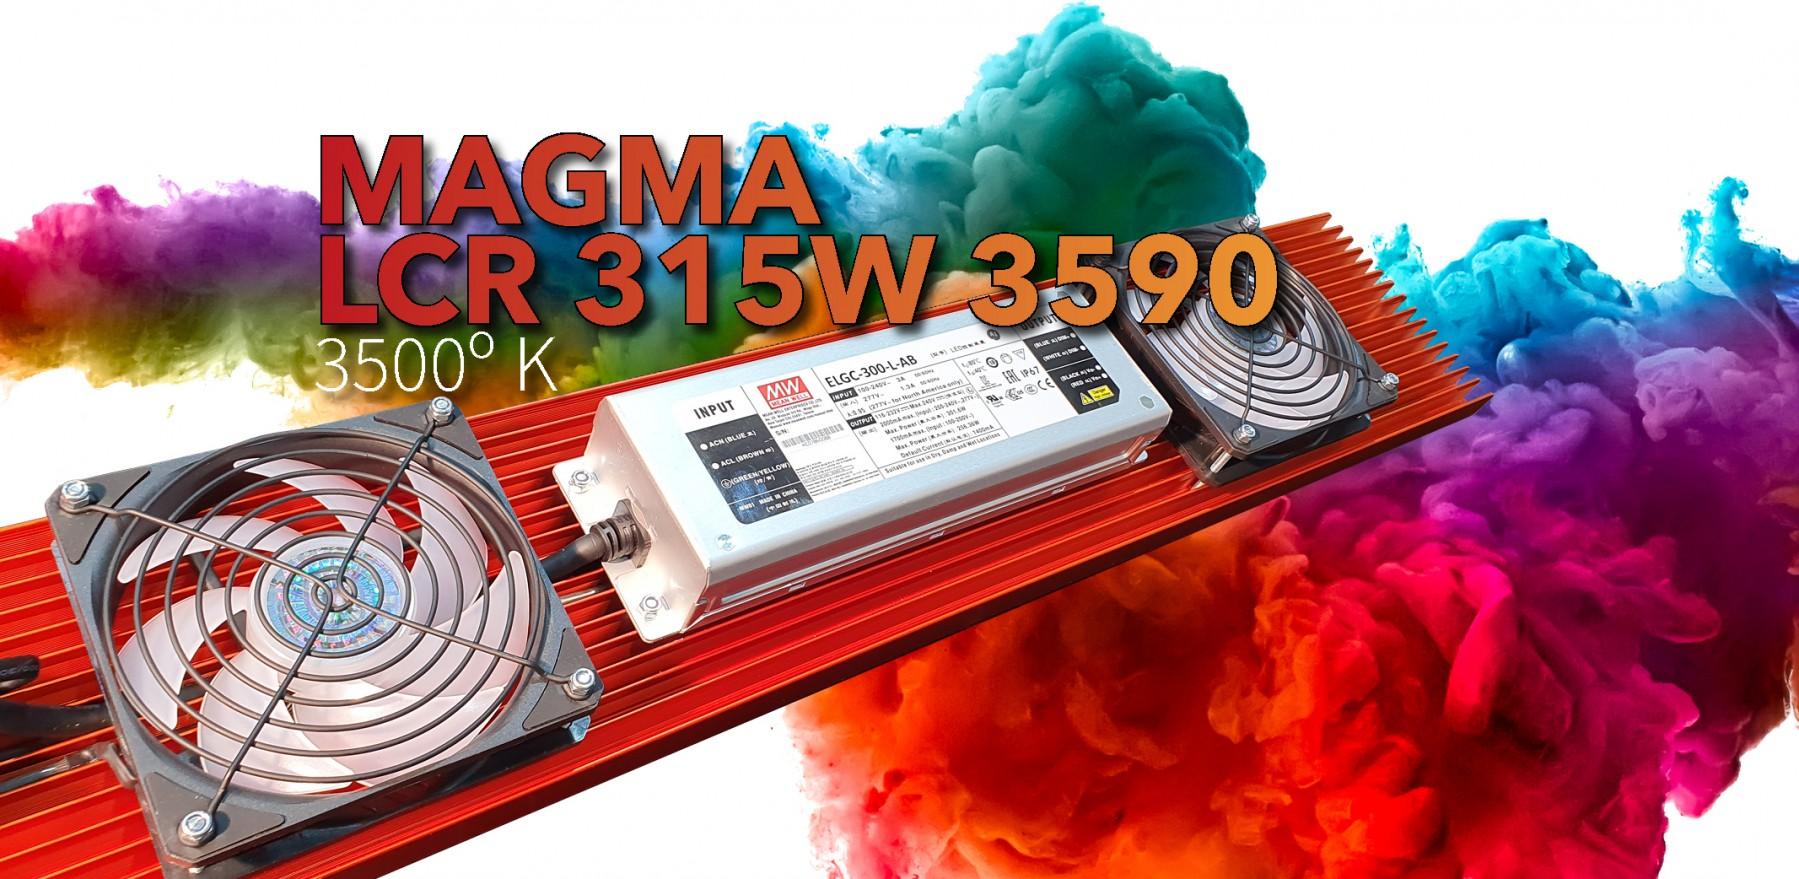 luminaria-led-magma-lcr-315w-cree-3590-lumilight 0